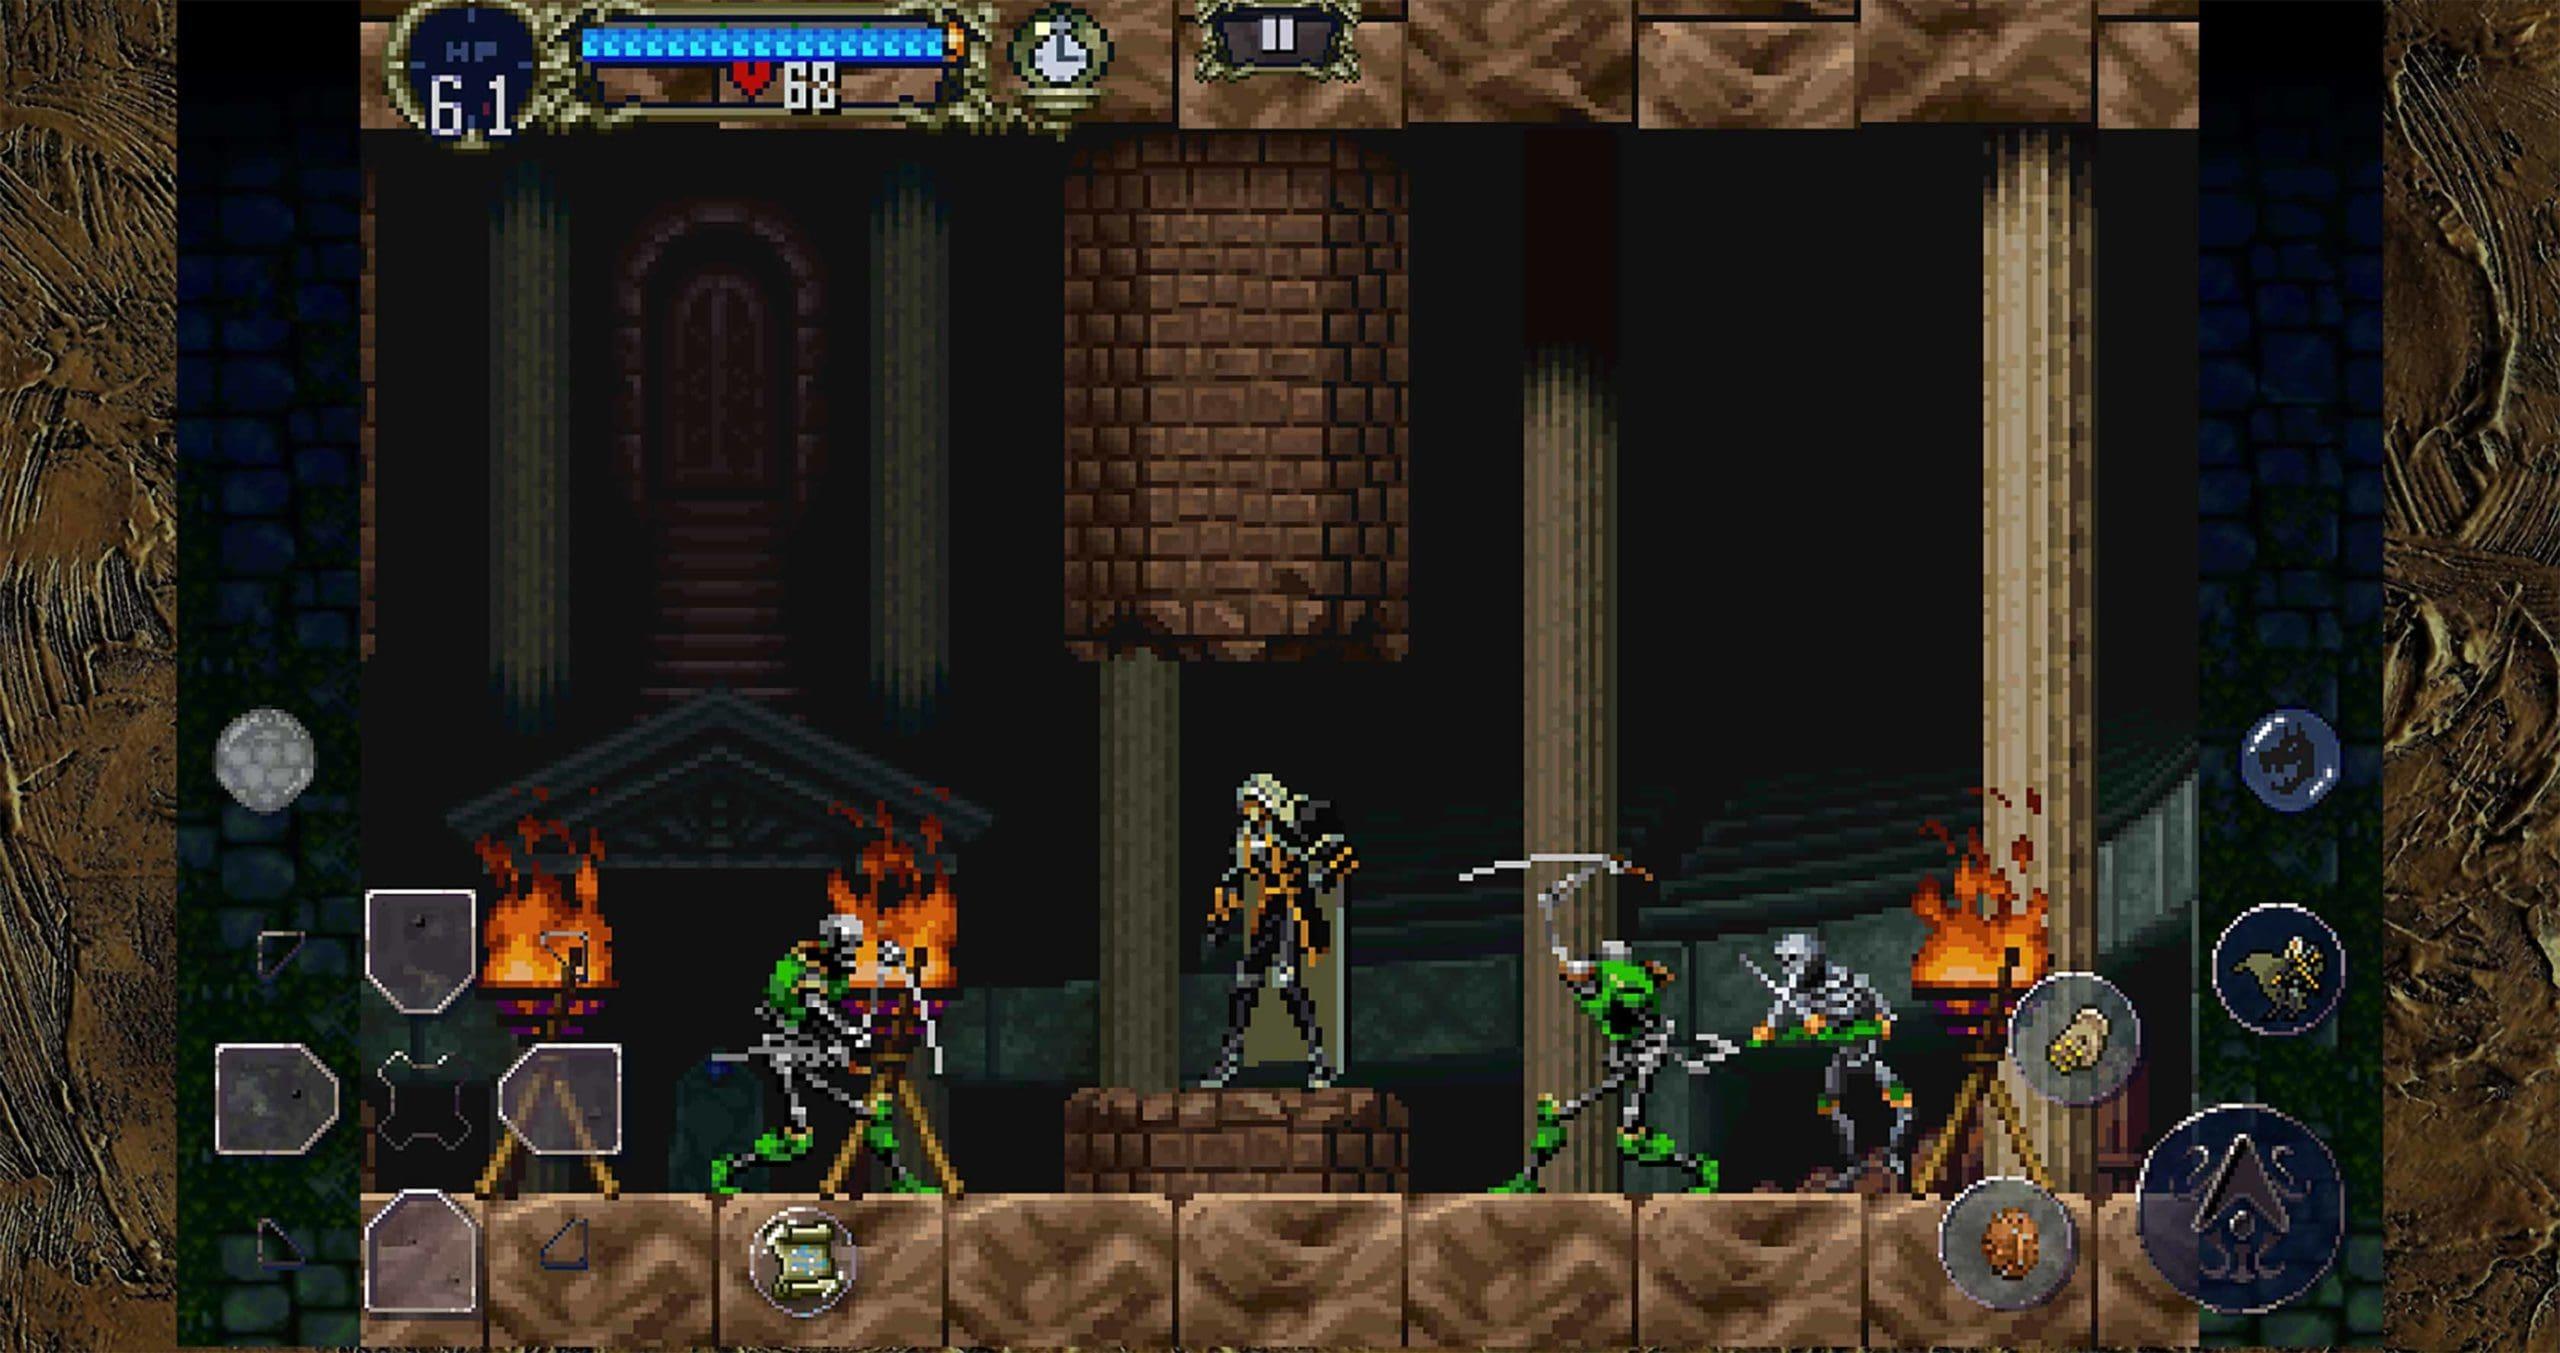 Castlevania: Symphony of the Night Screenshot 2